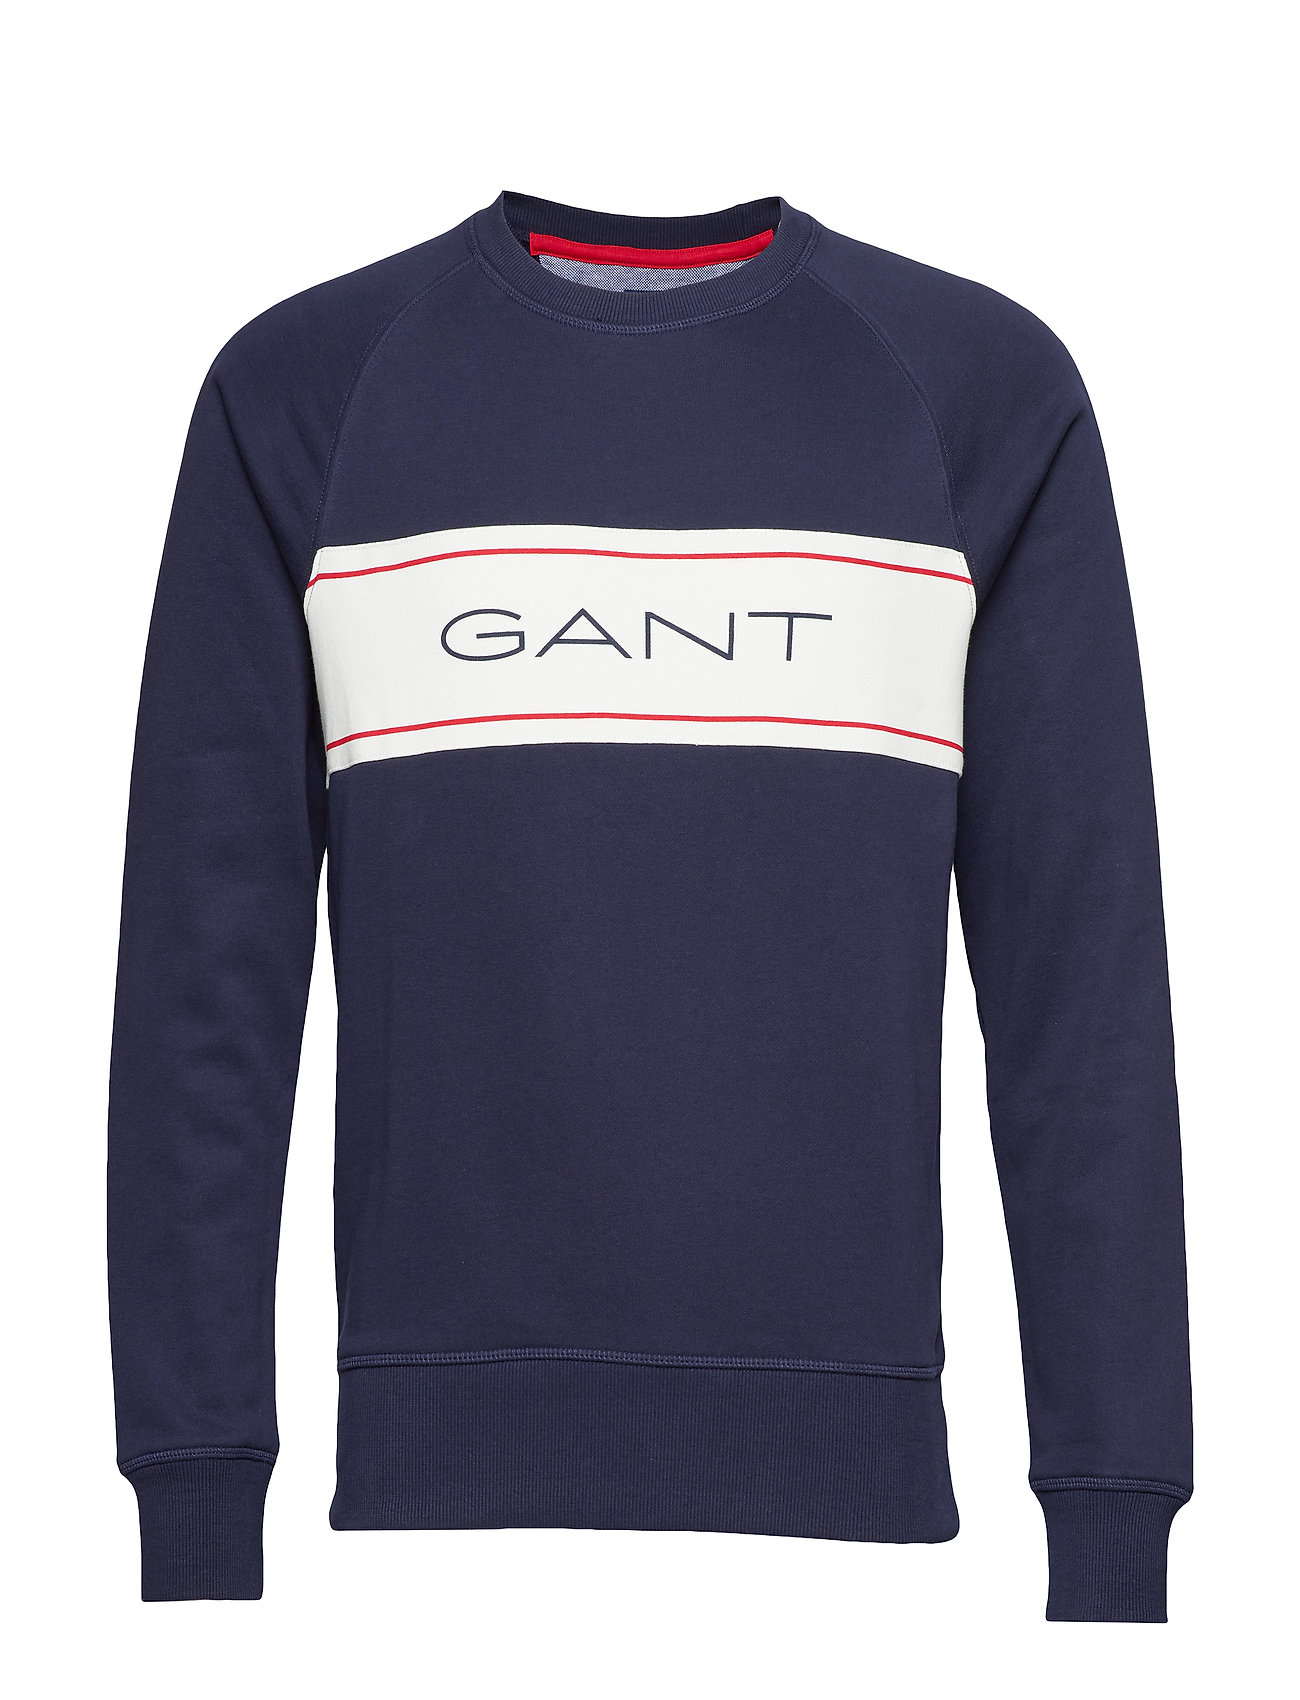 GANT O1.GANT ARCHIVE STRIPE C-NECK SWEAT